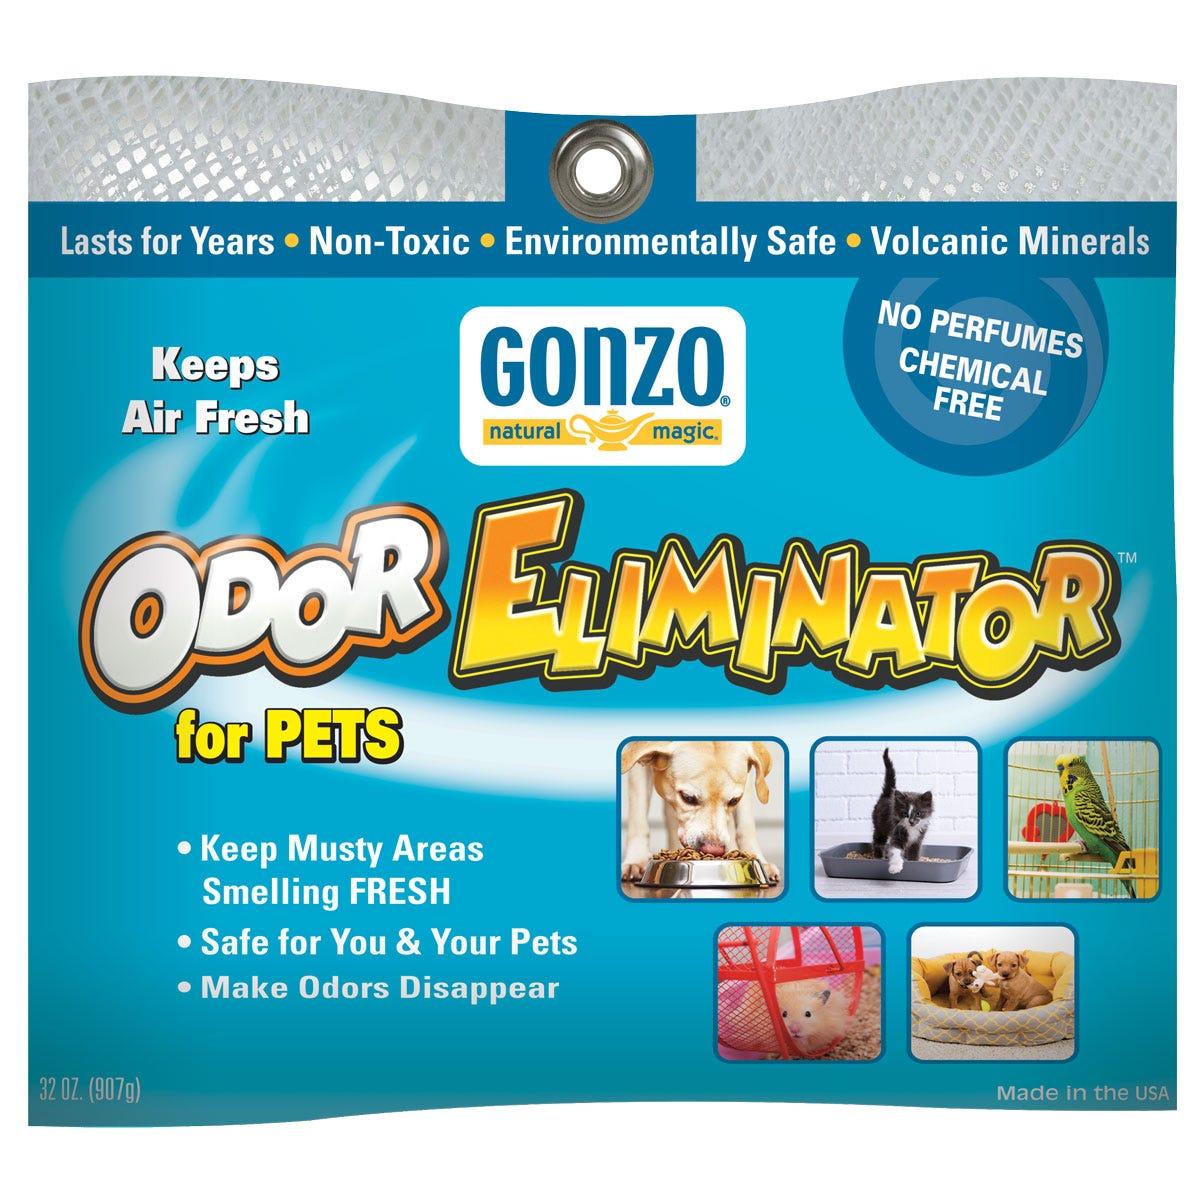 https://googone.com/media/catalog/product/p/e/pet-odor-eliminator_front_1_1.jpg